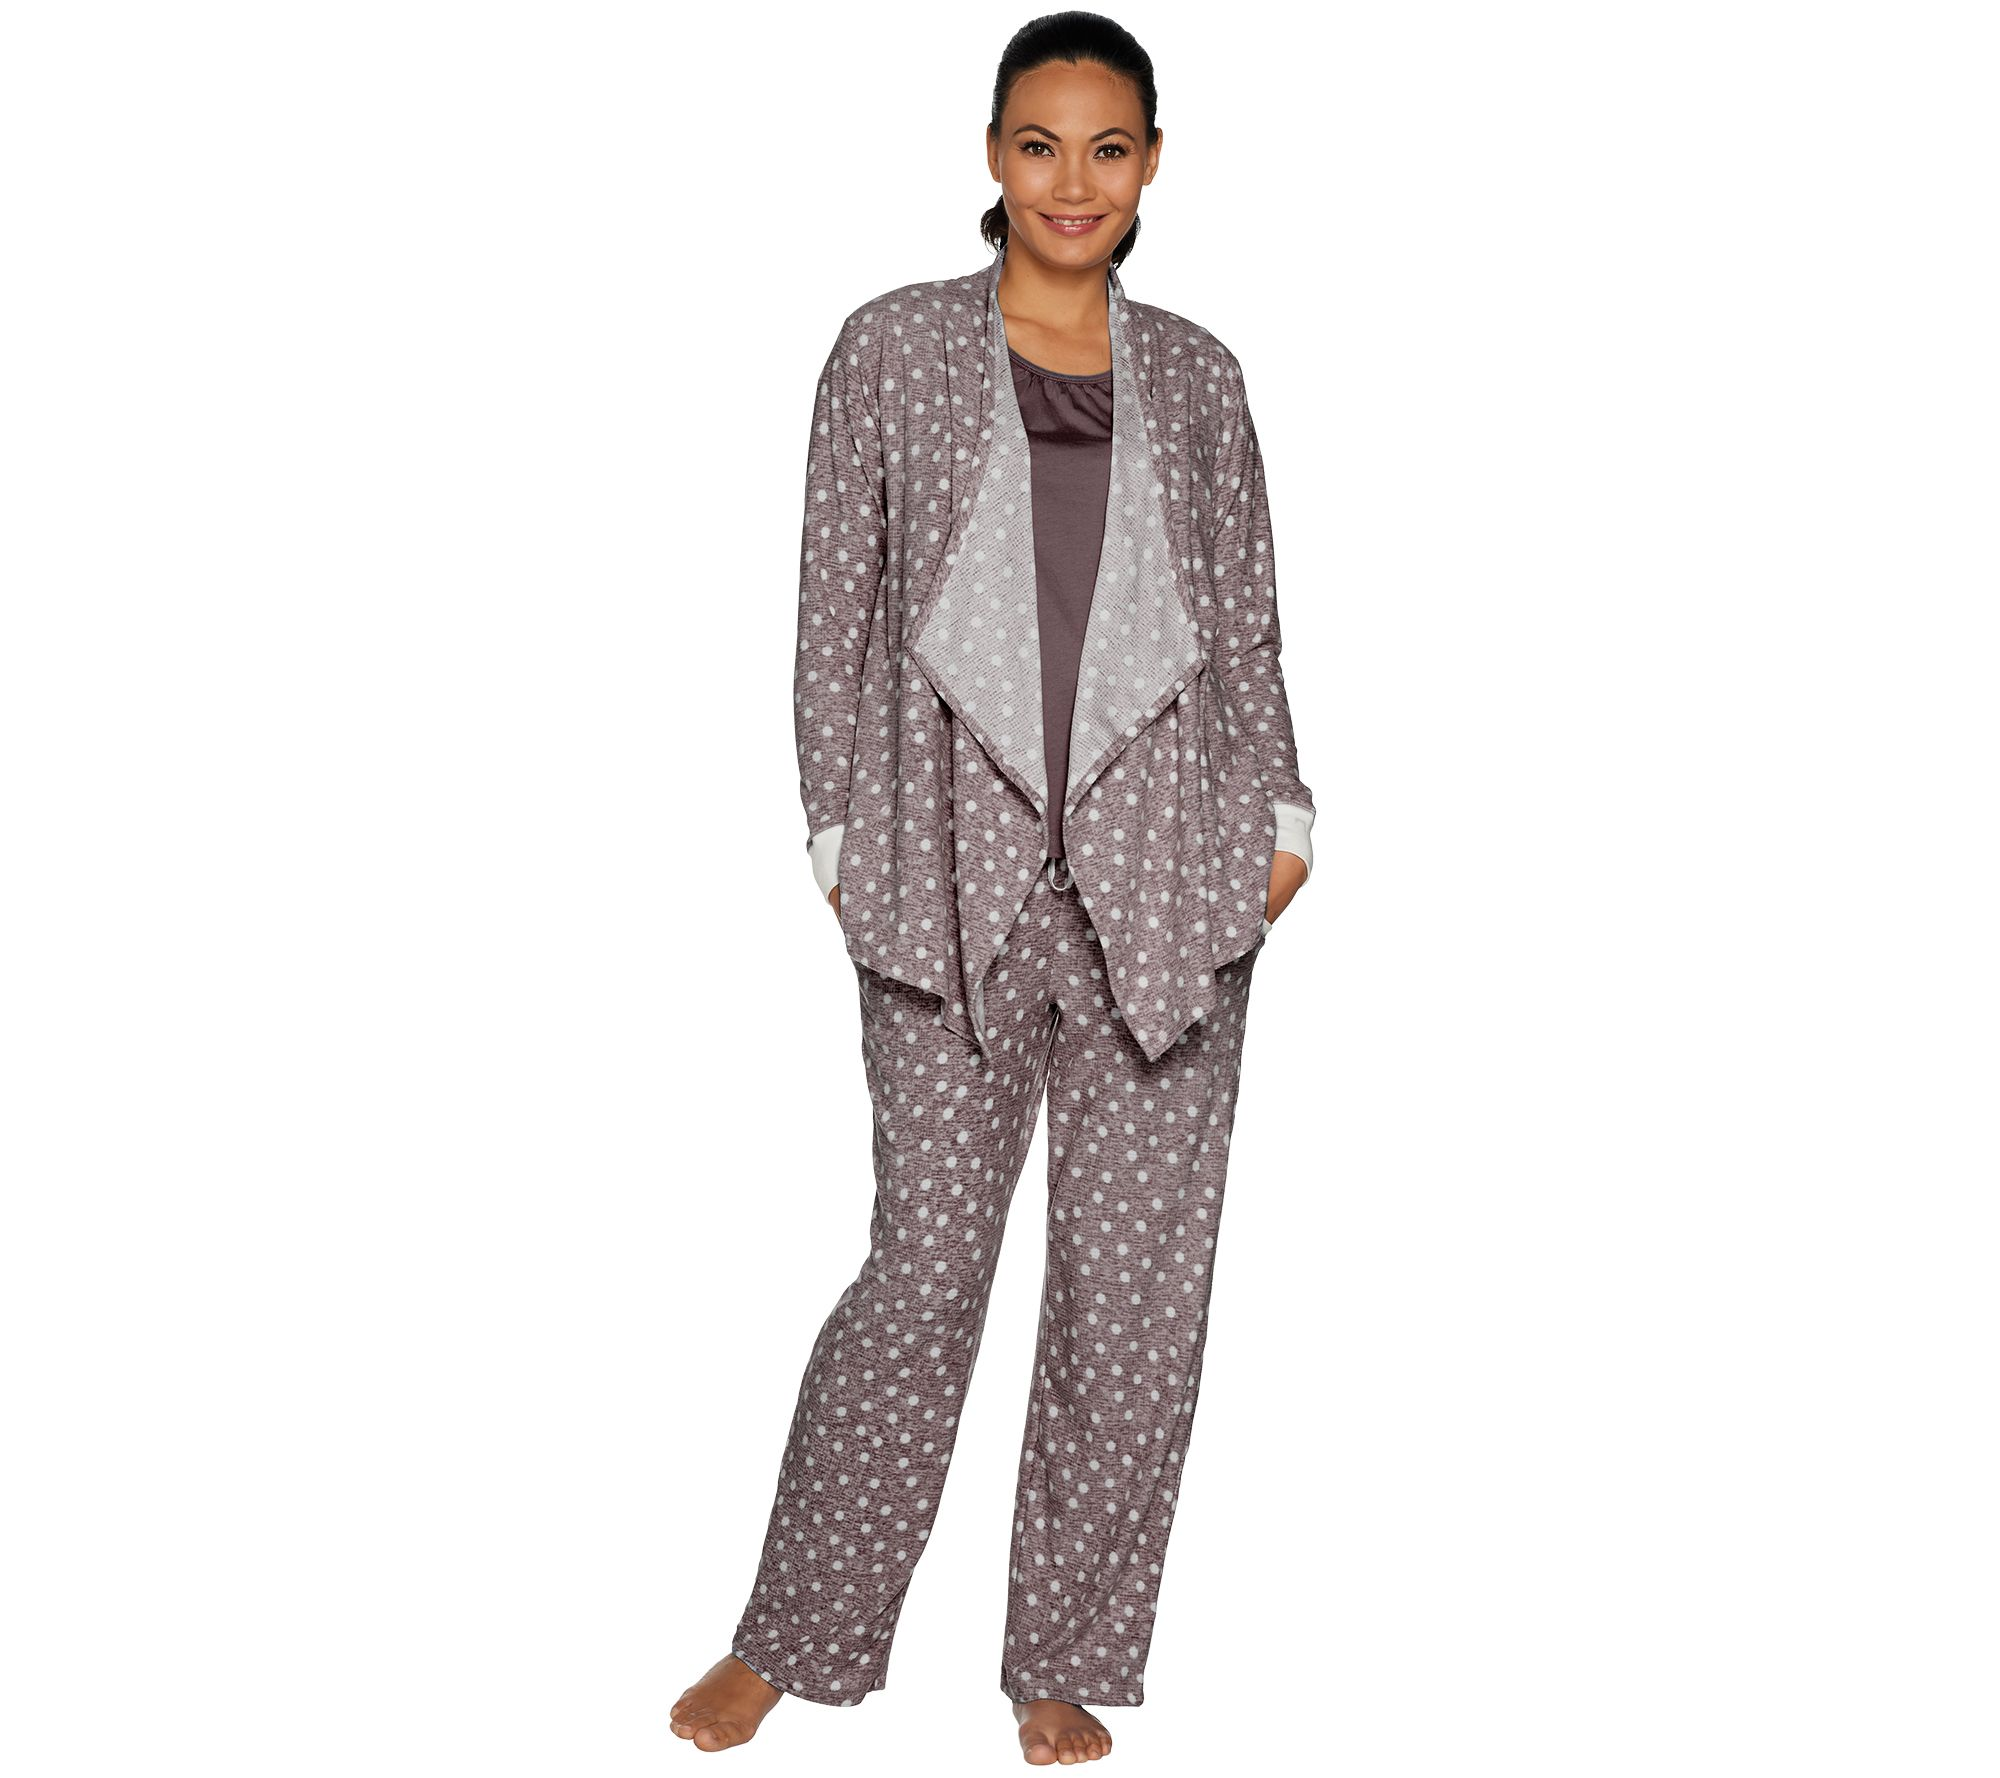 7f3663480f88 Carole Hochman Stretch Waffle Fleece 3-Piece Pajama Set - Page 1 — QVC.com